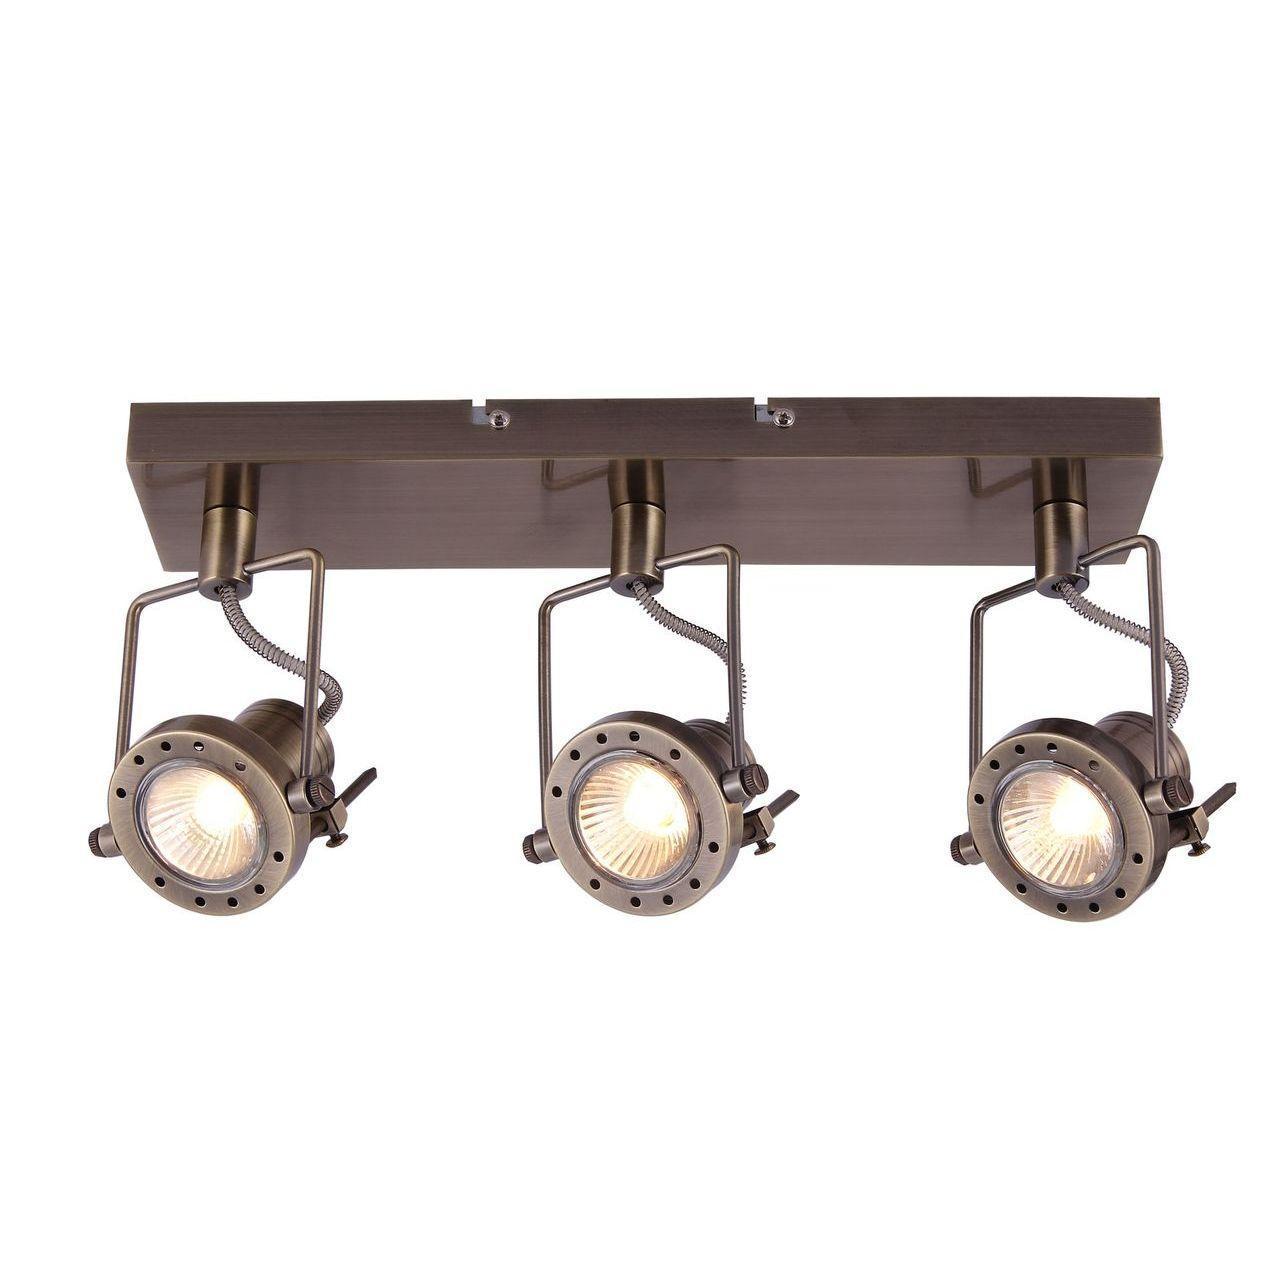 Фото - Спот Arte Lamp Costruttore A4300PL-3AB спот arte lamp costruttore a4300pl 4ab